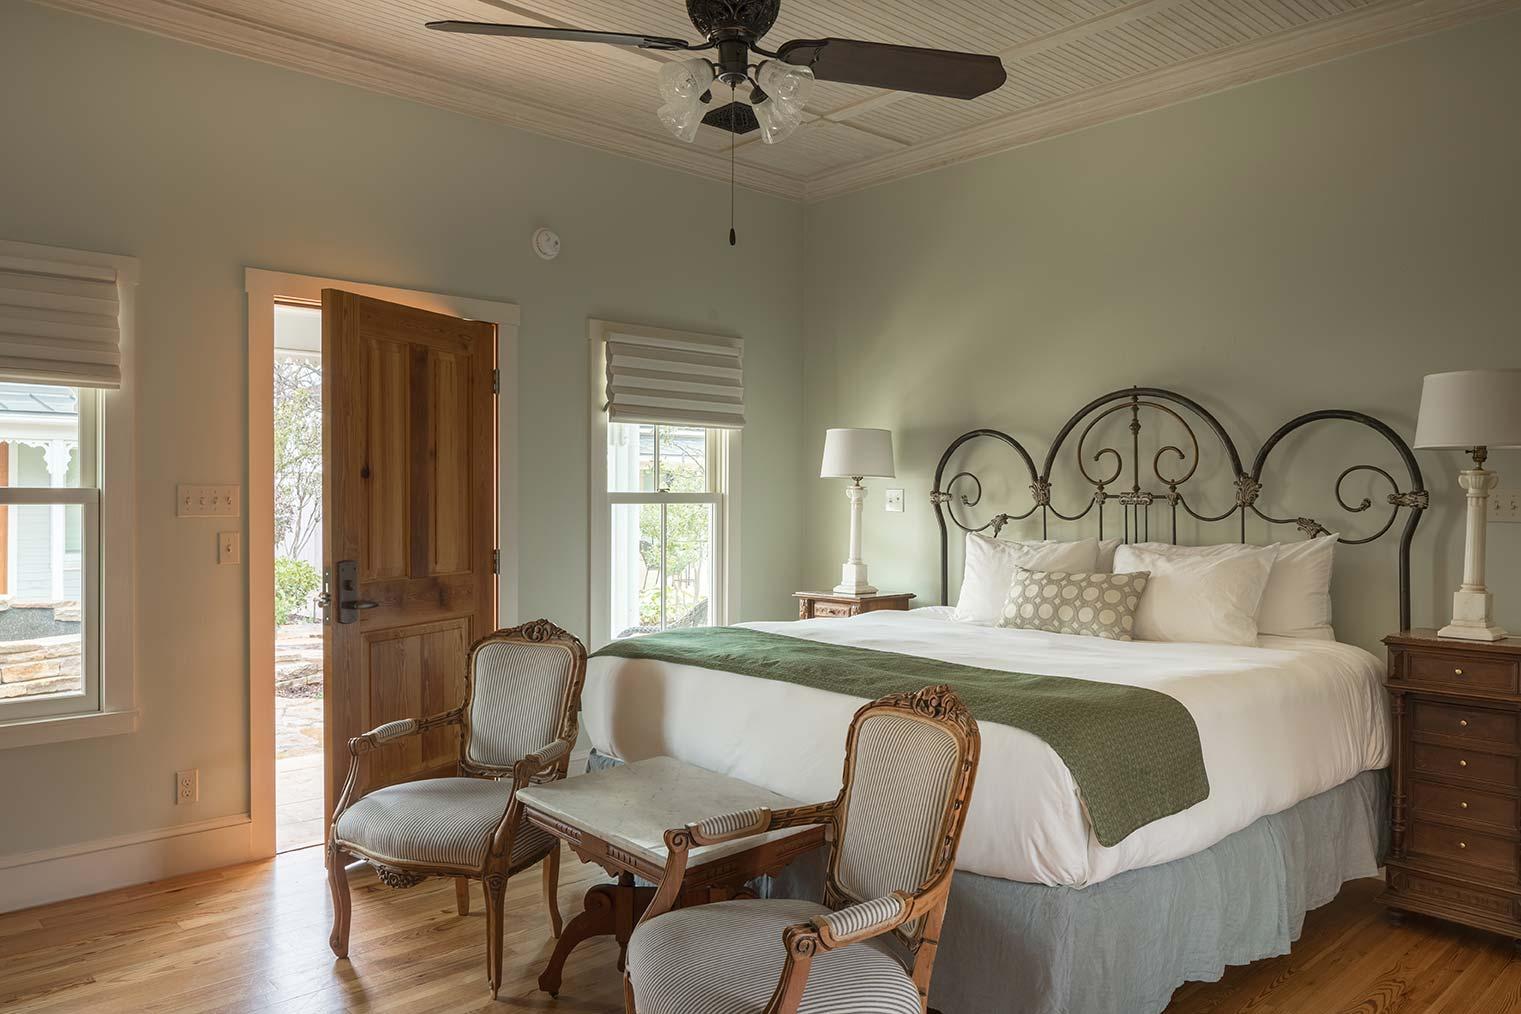 blacksmith-quarters-fredericksburg-realty-texas-commercial-real-estate-for-sale-investment-hospitality.jpg